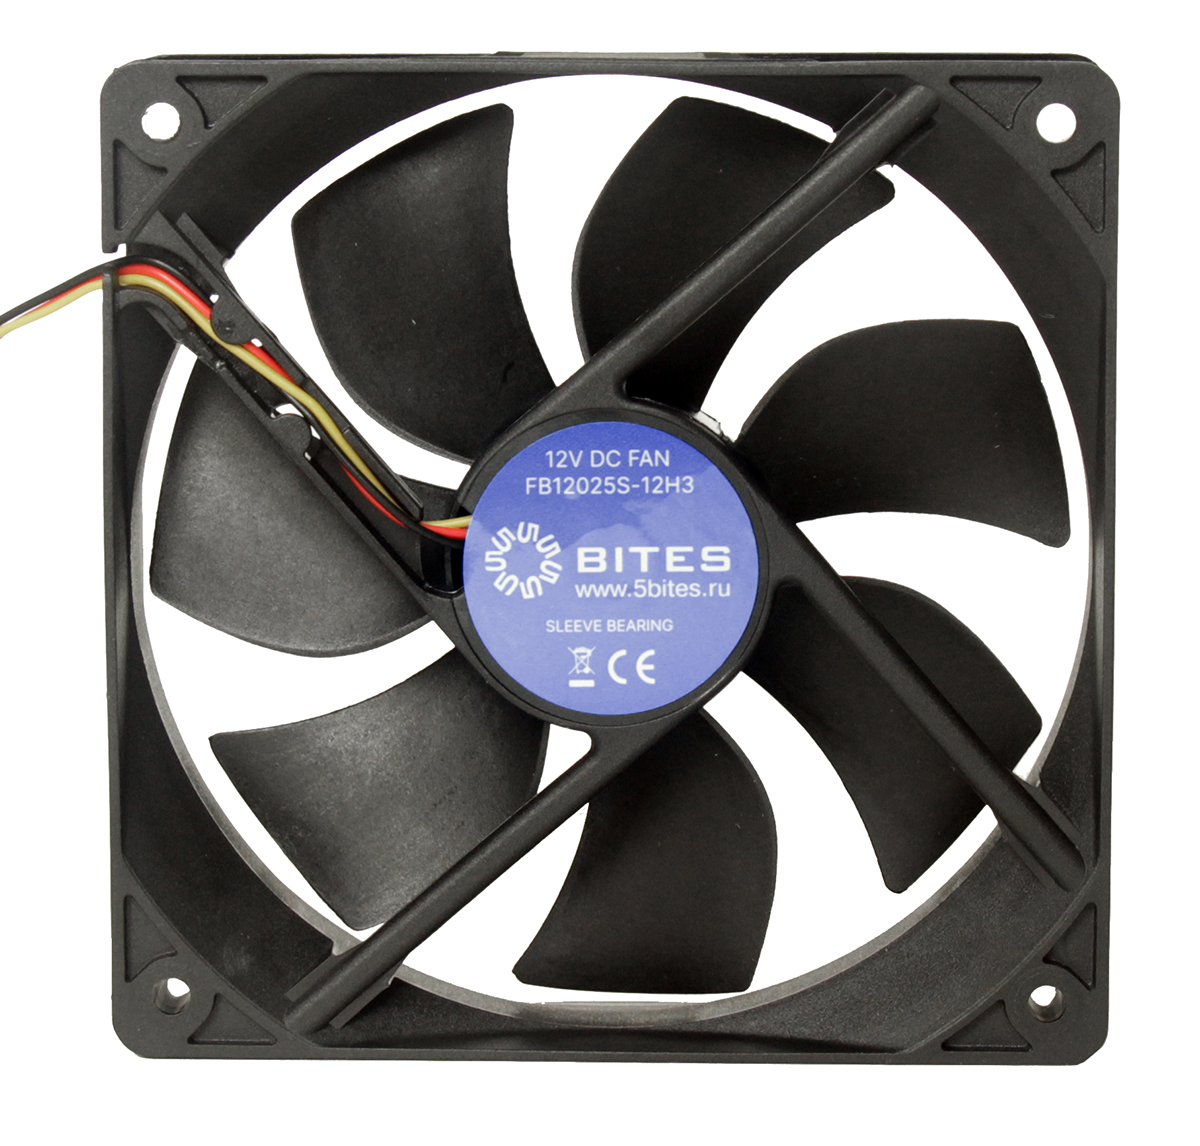 Вентилятор 5bites FB12025S-12H3